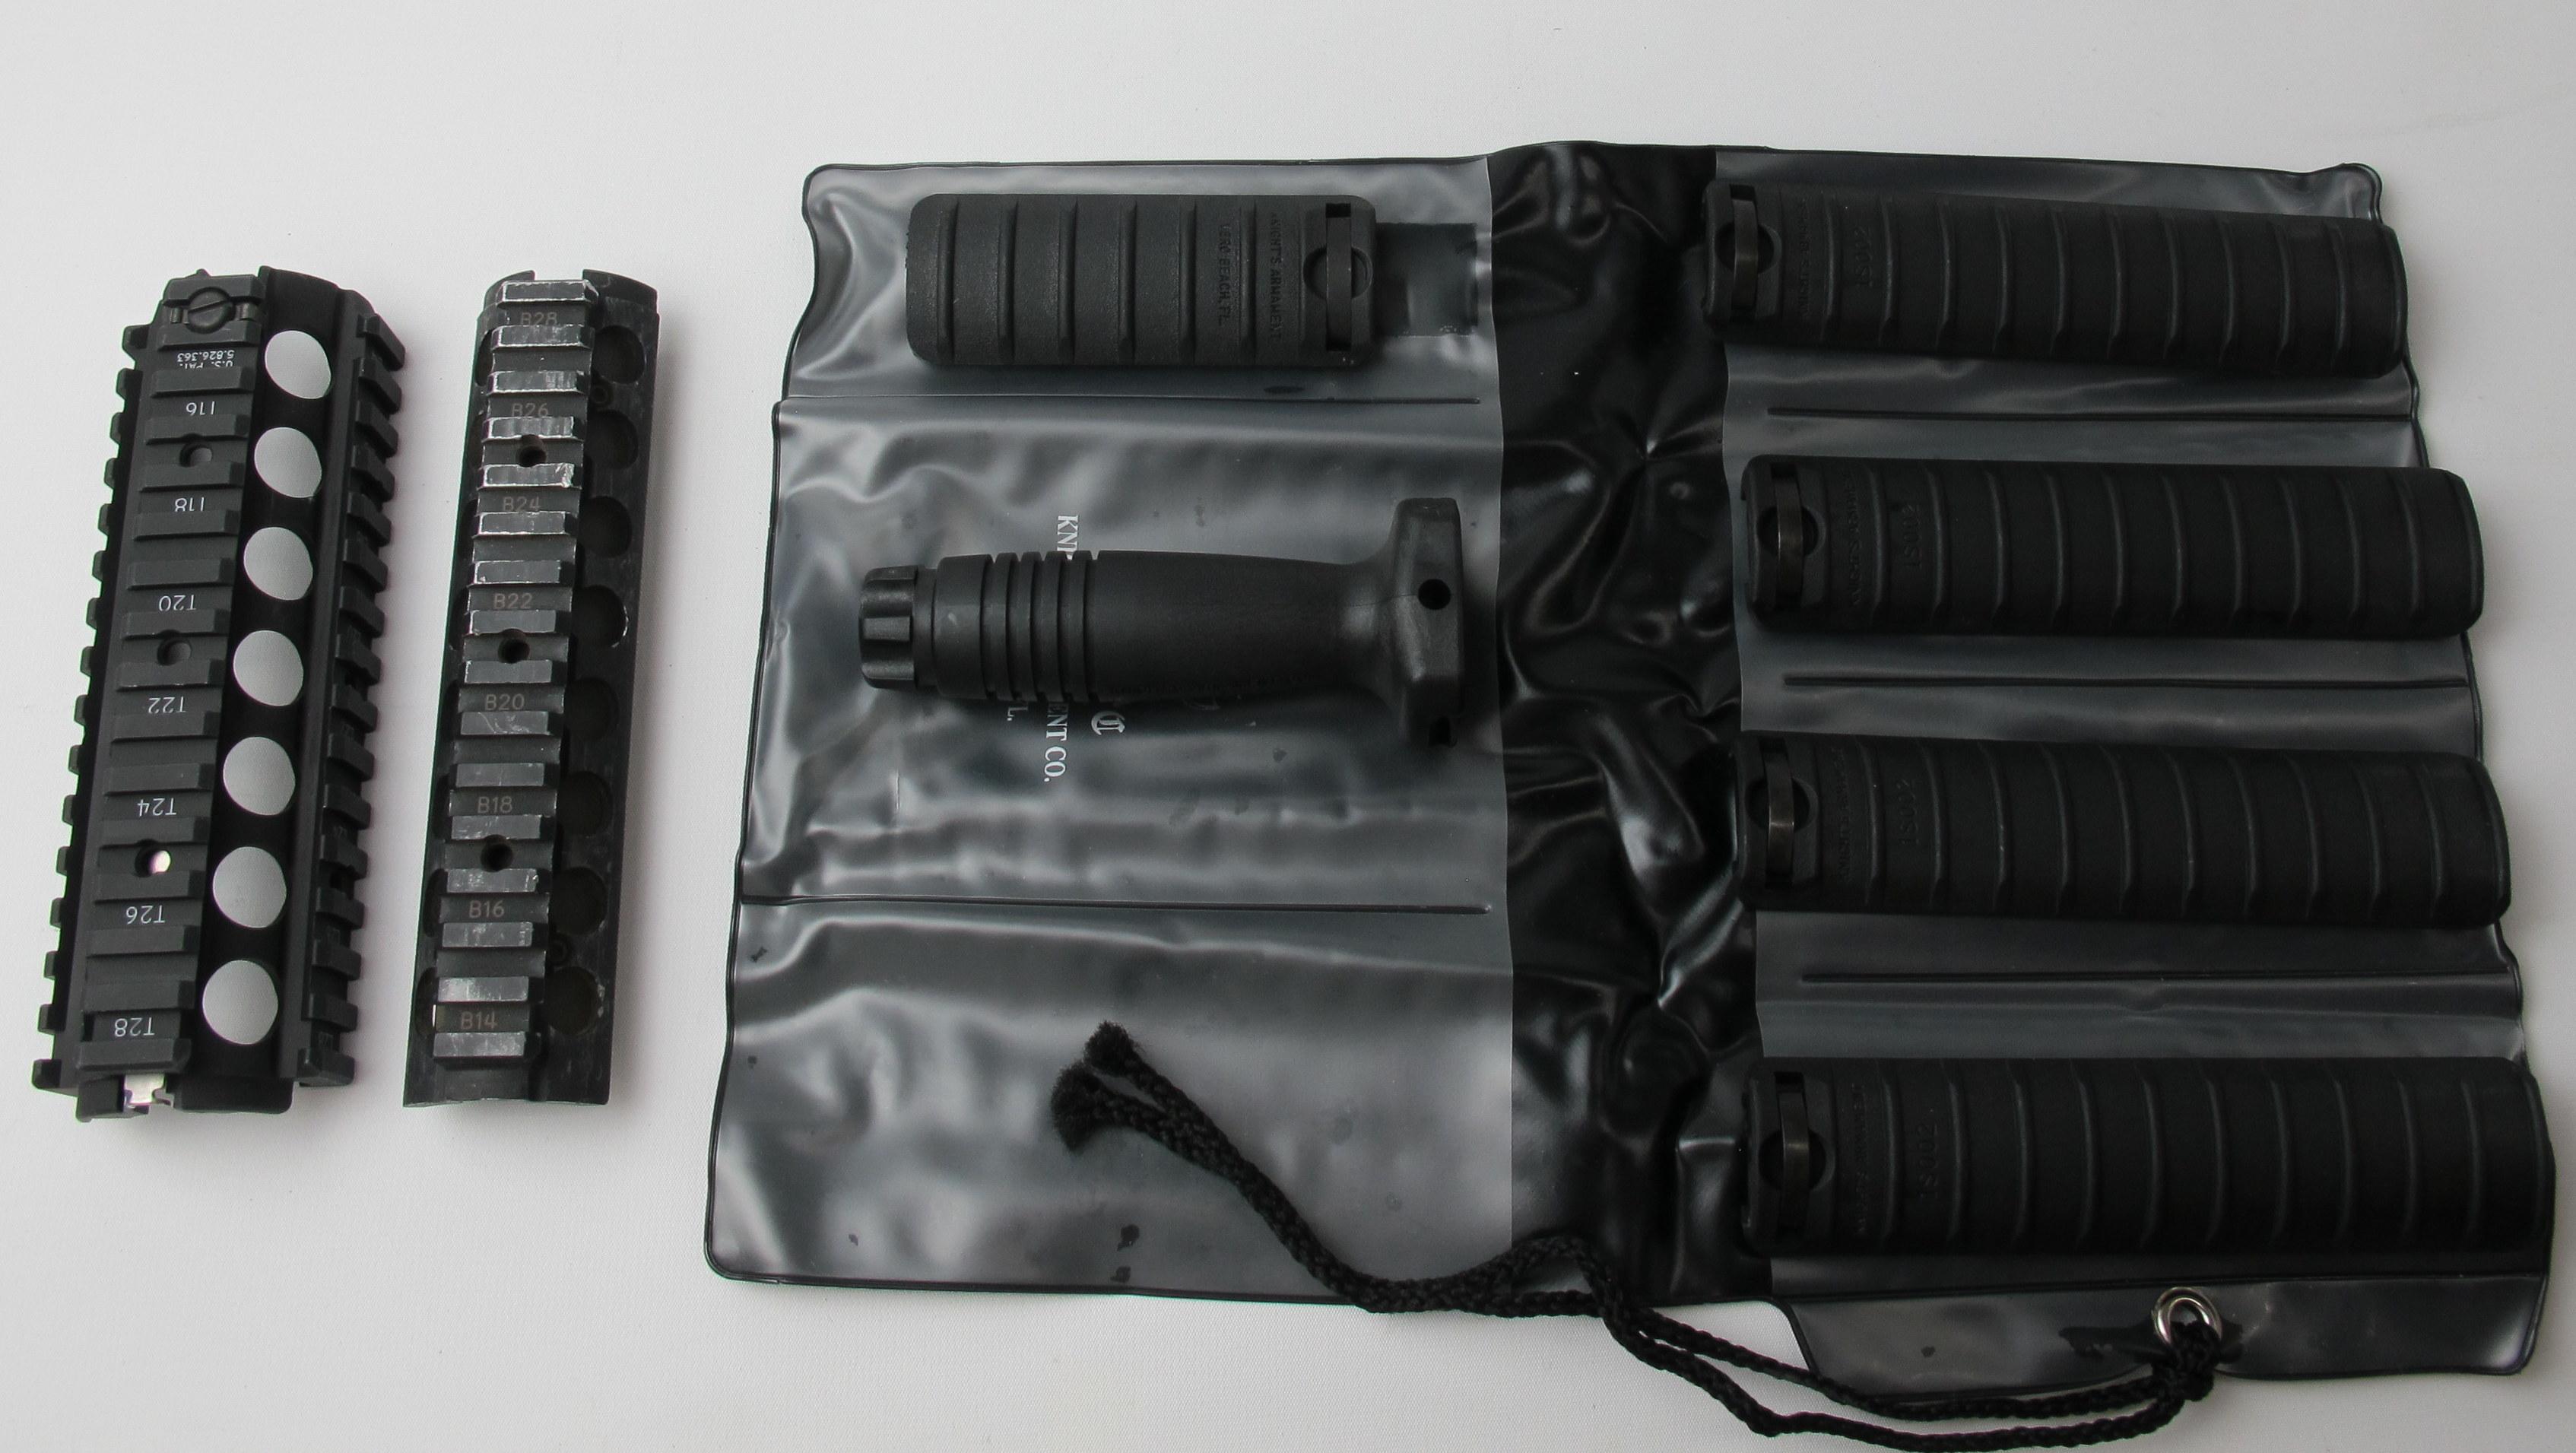 Rail, M4, System, Pistol grip